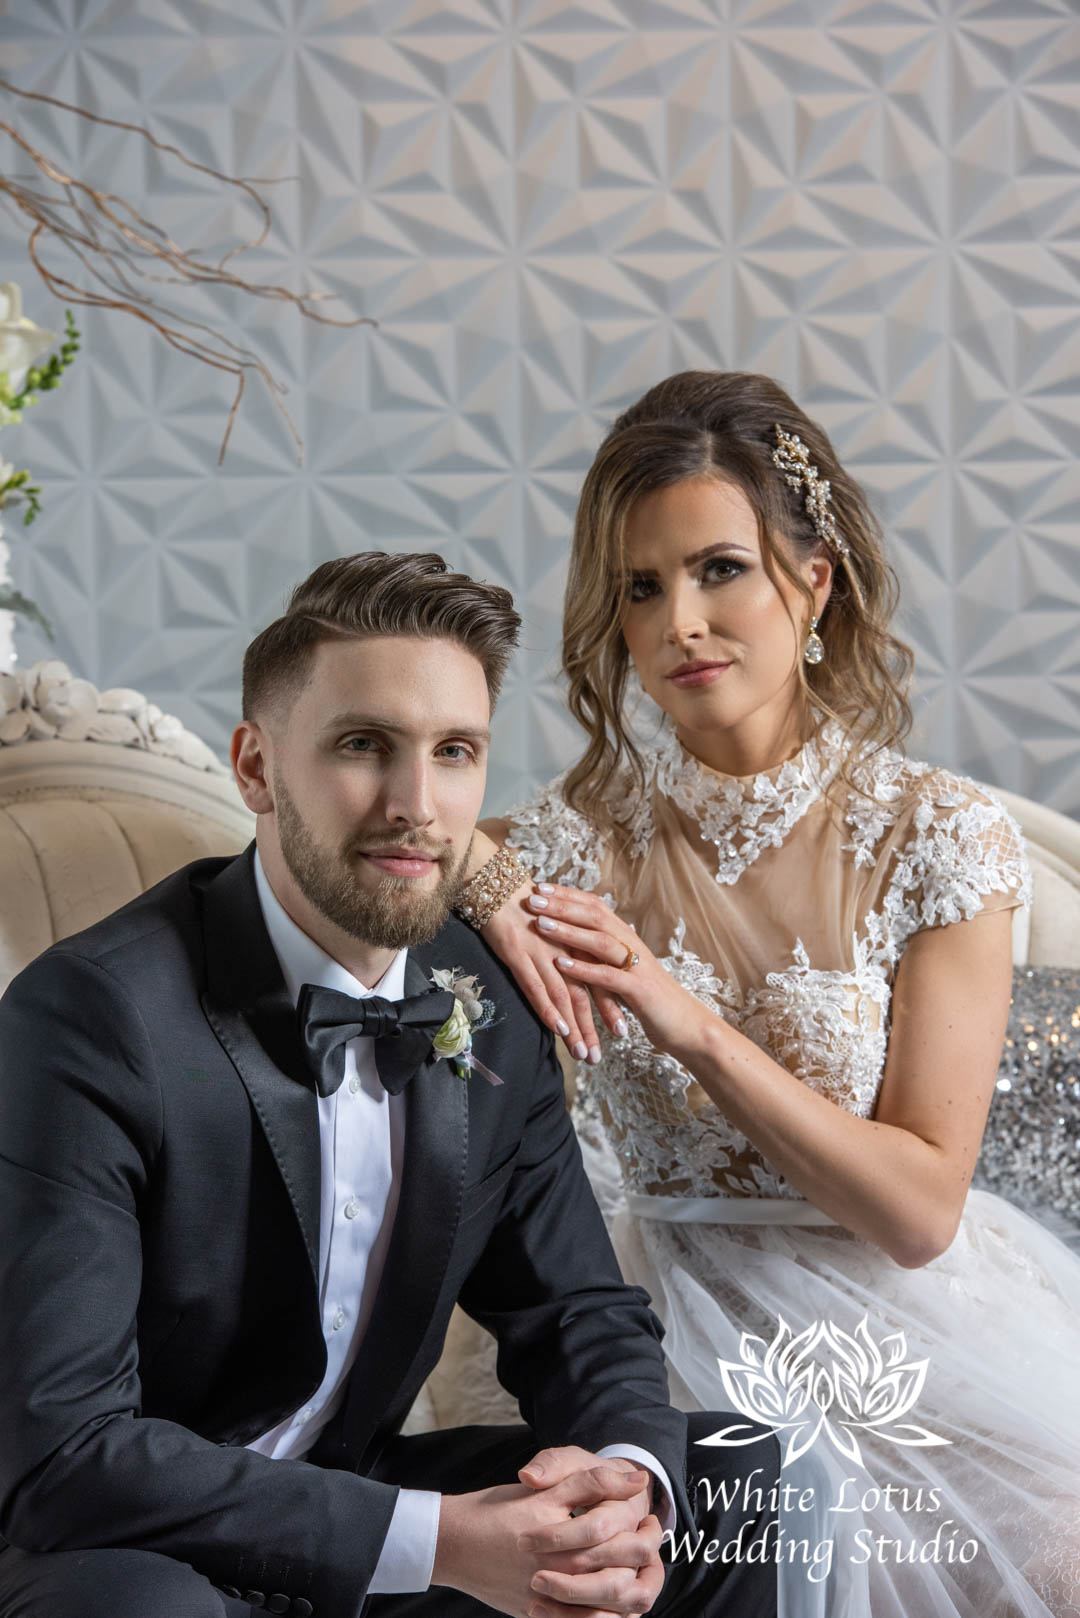 075- GLAM WINTERLUXE WEDDING INSPIRATION